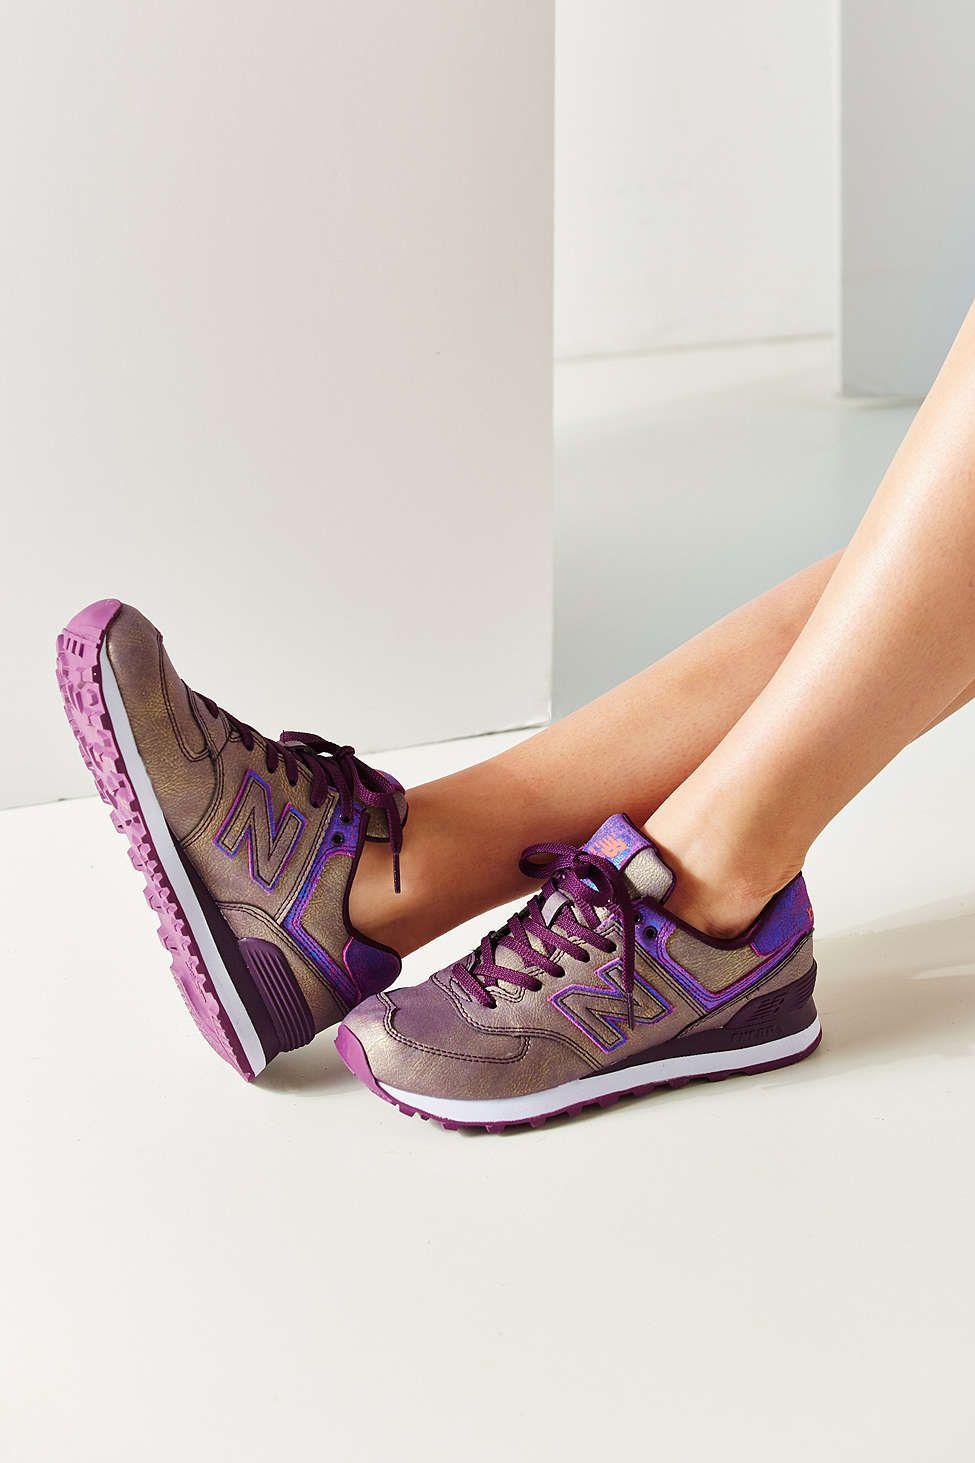 new balance 574 women new balance running sneakers